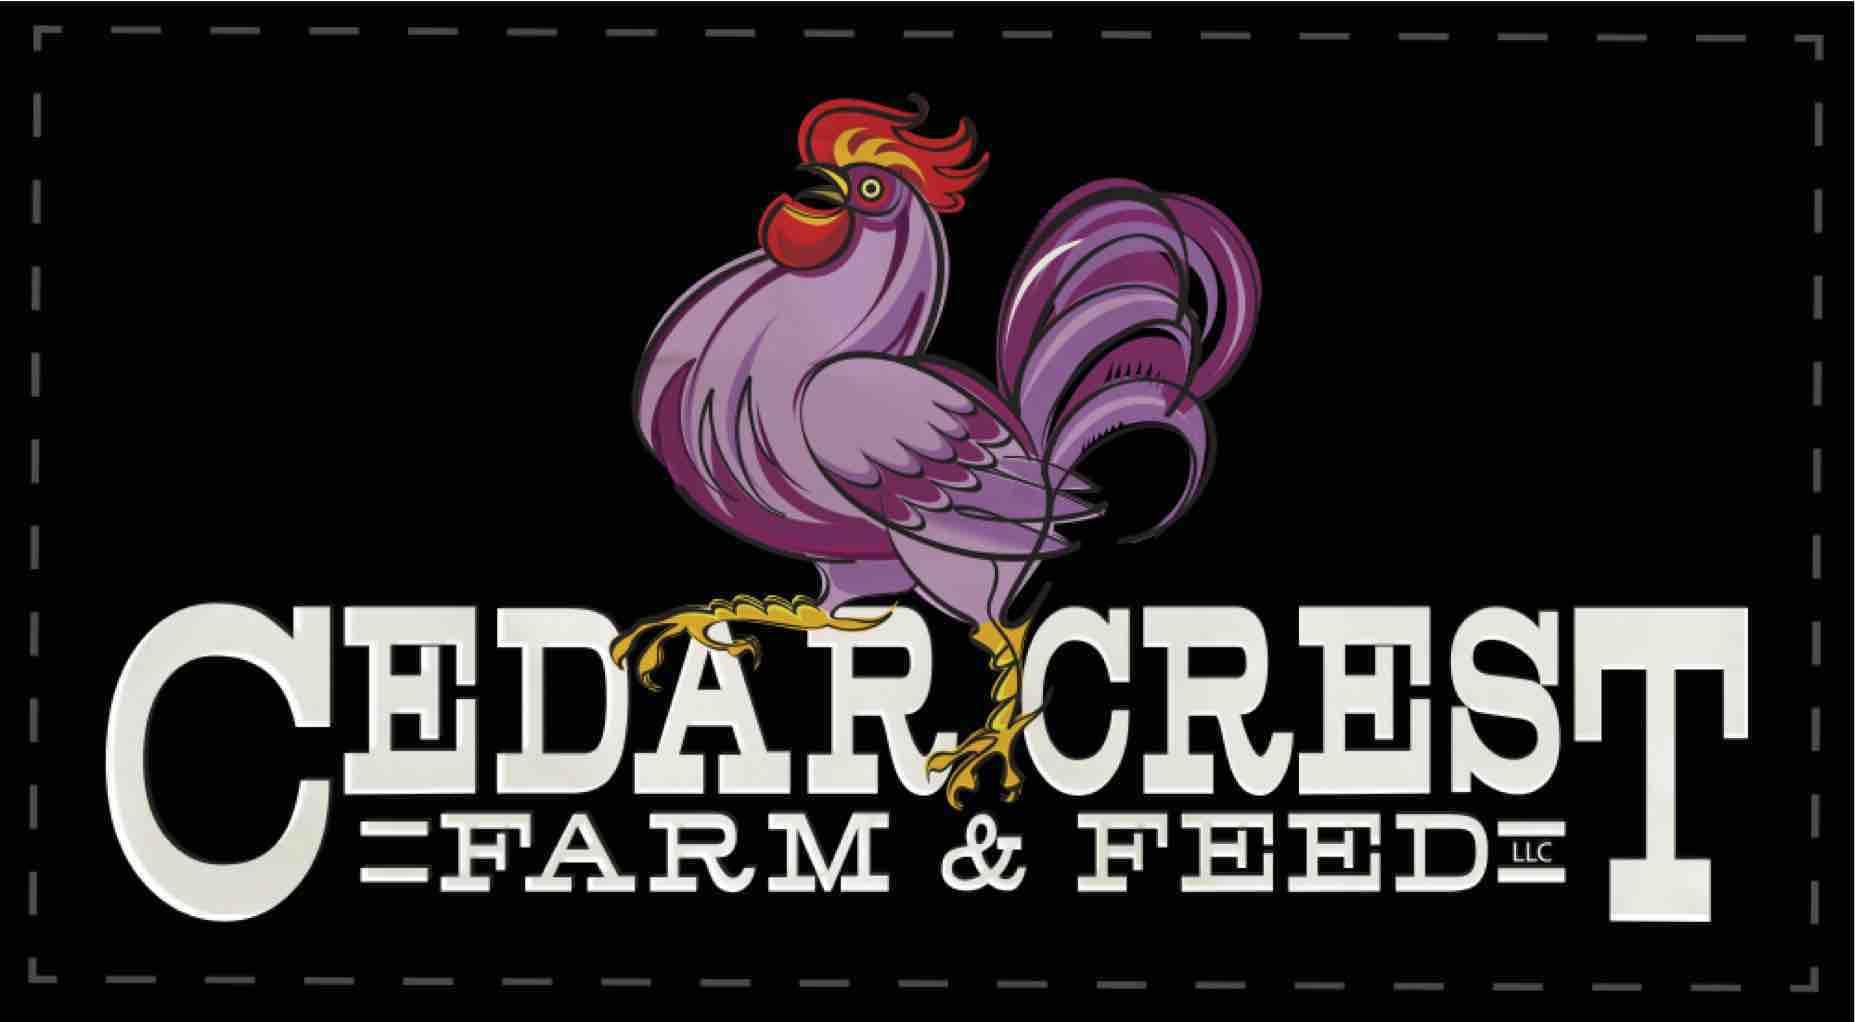 Cedar Crest Farm and Feed